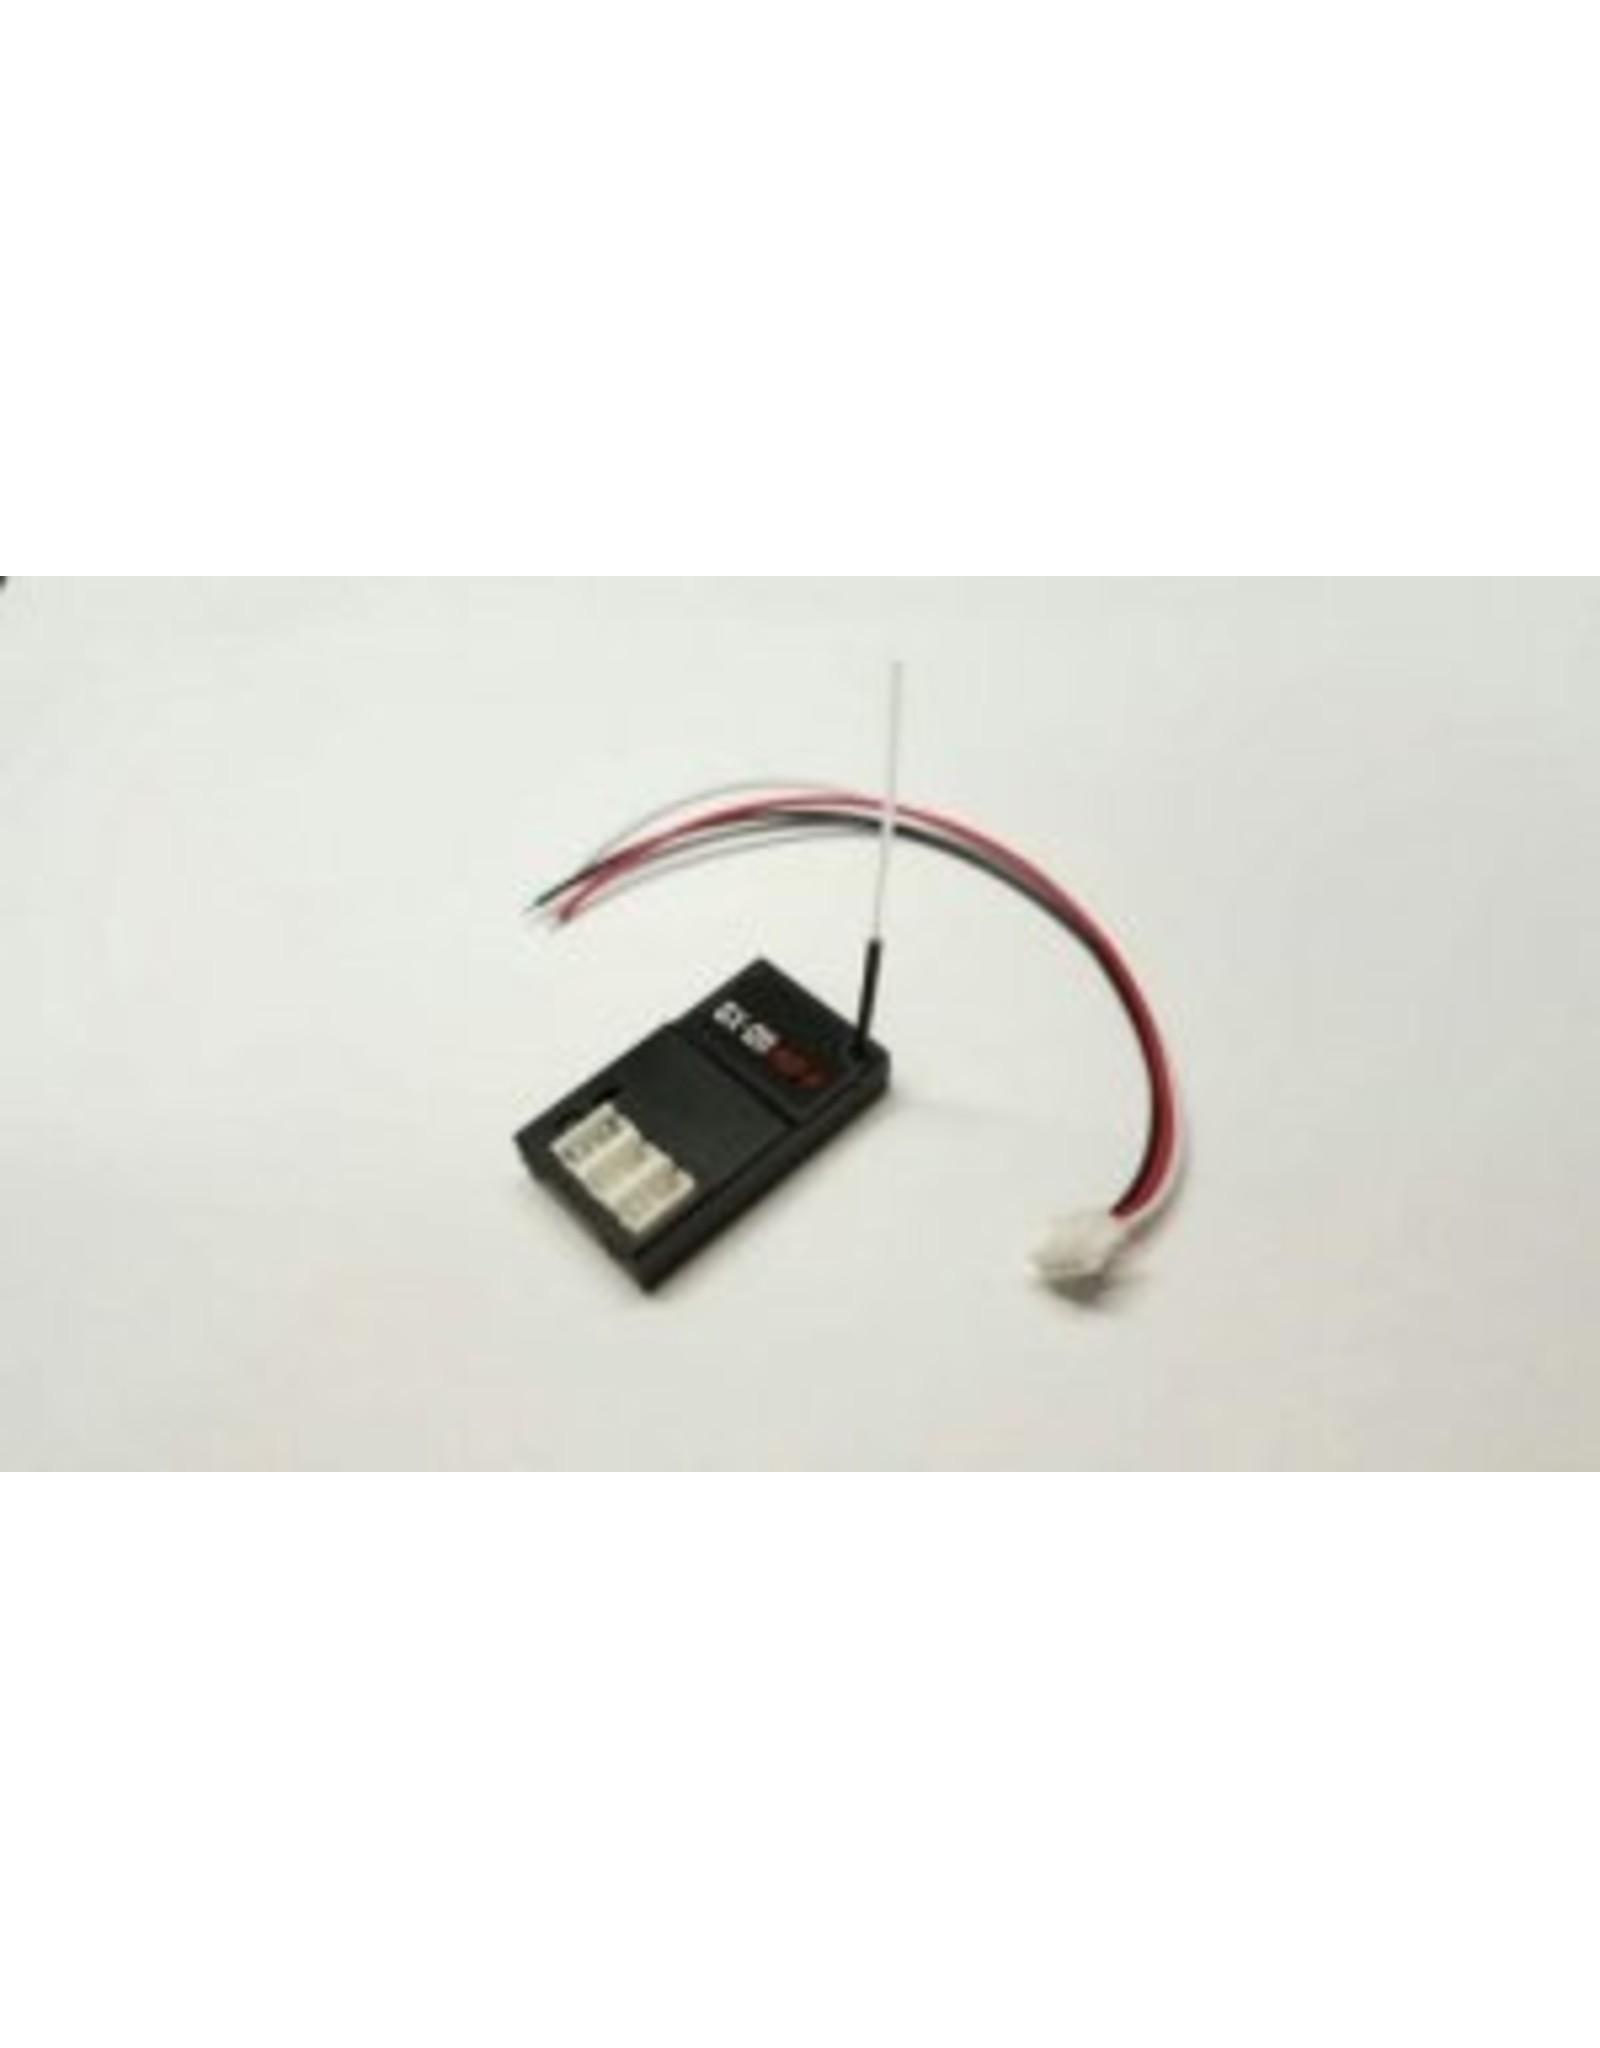 GL Racing 2.4GHz ASF-H RX Unit (GP0003P)